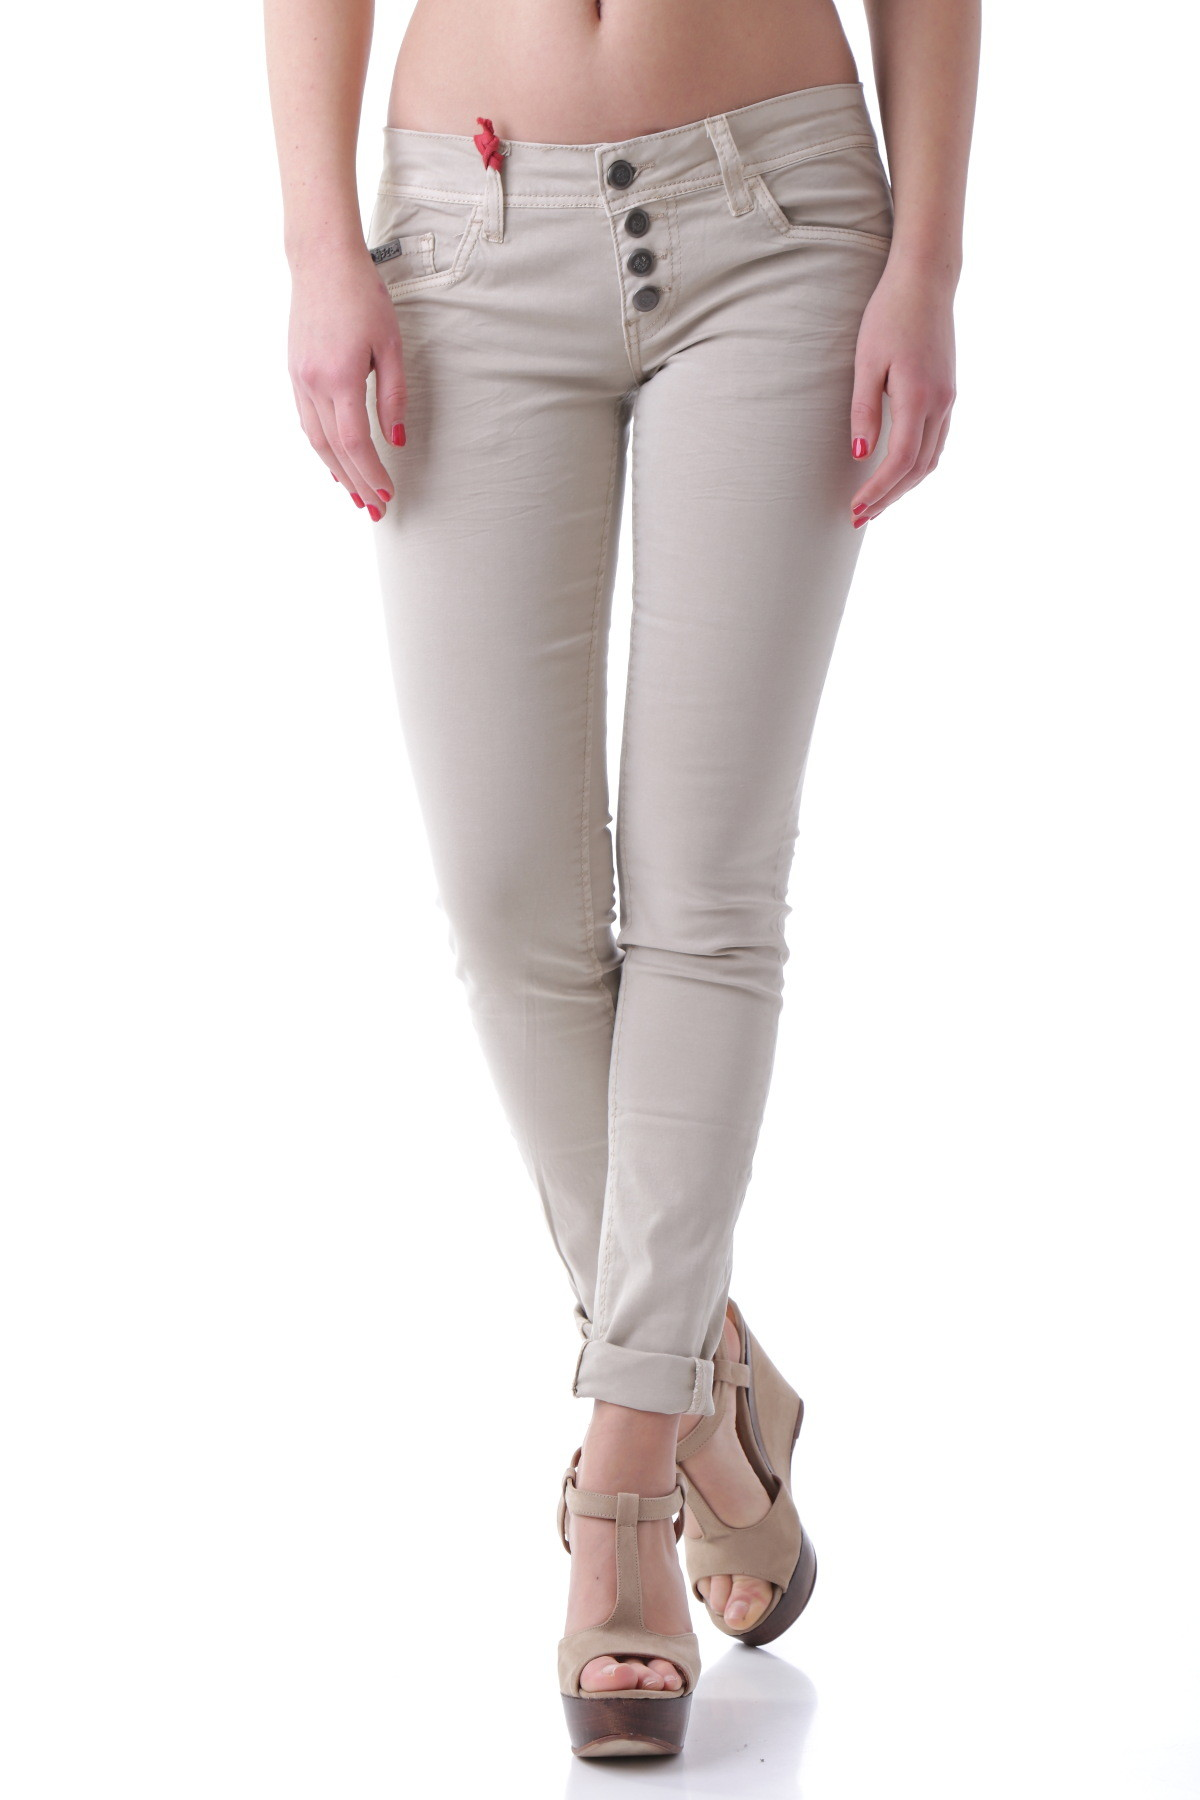 Marchio: 525; Genere: Donna; Tipologia: Pantaloni…525